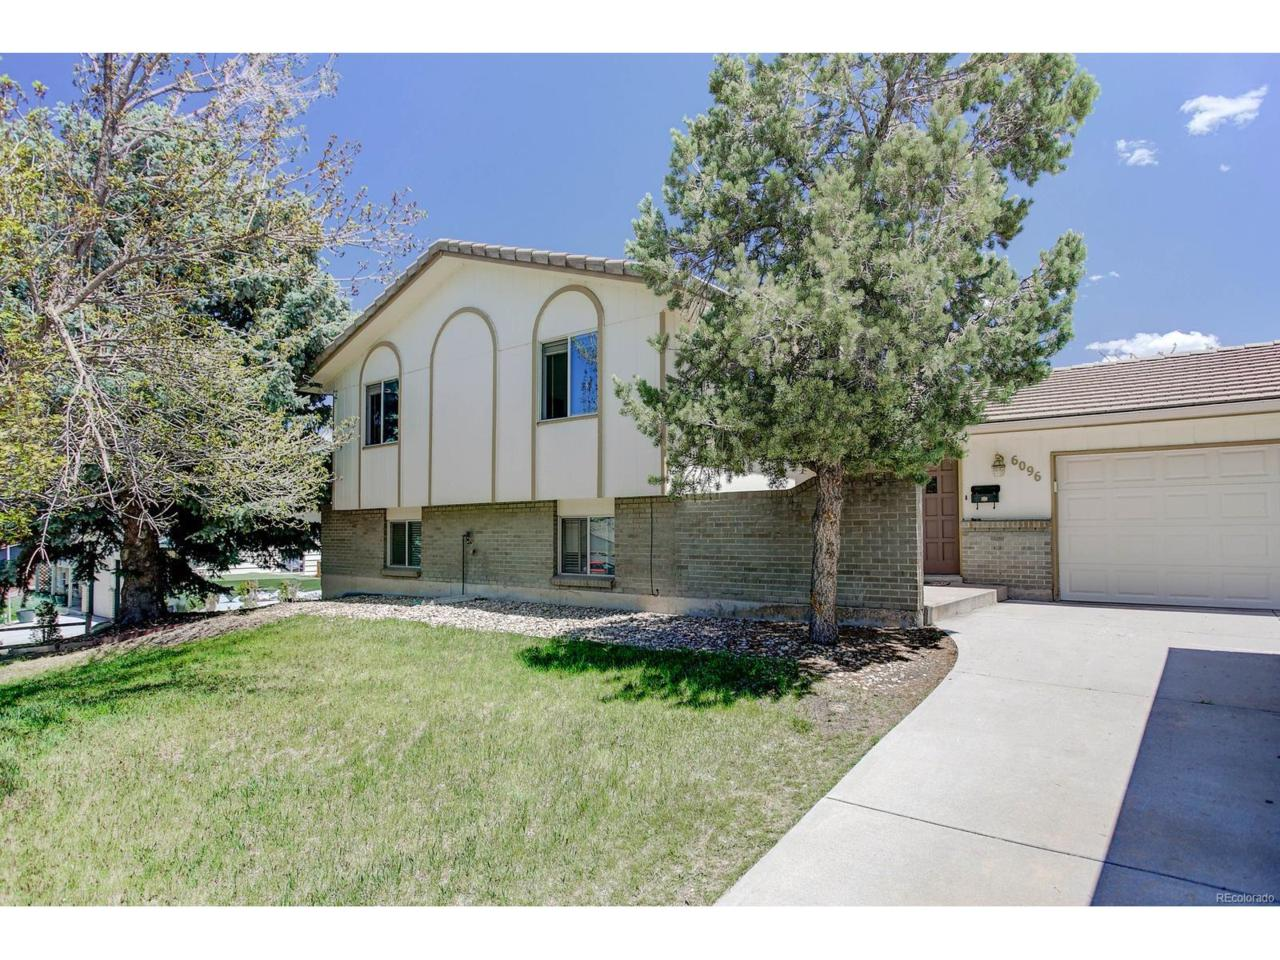 6096 S Leyden Street, Centennial, CO 80111 (MLS #3344753) :: 8z Real Estate